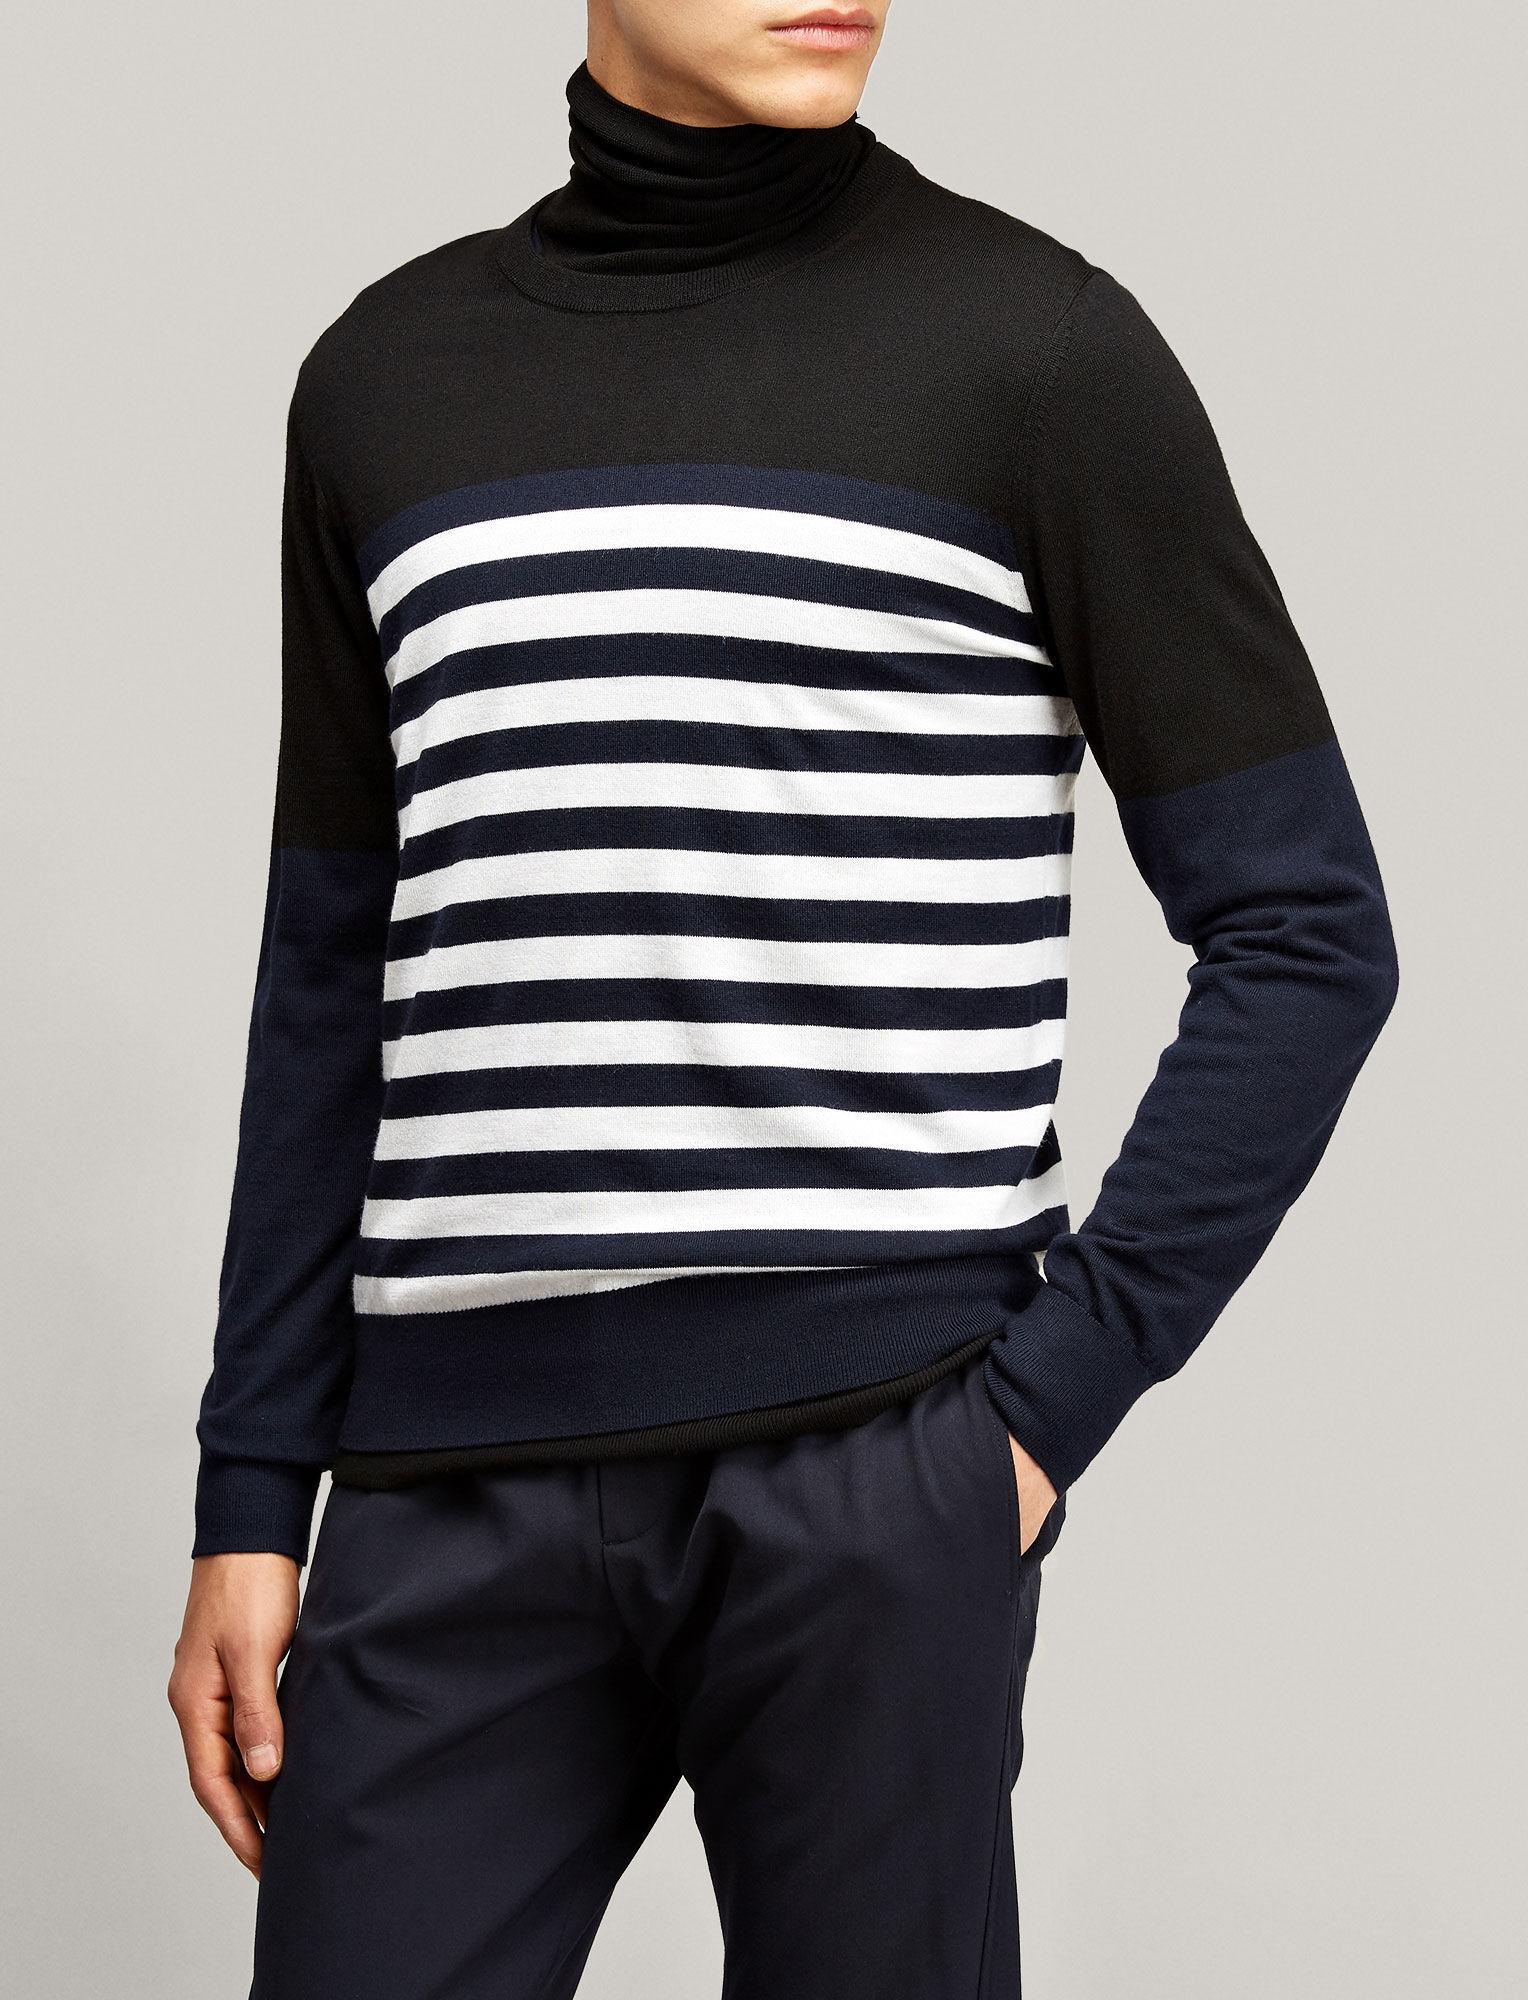 Joseph, Stripe Merinos Novelty Knit, in BLACK